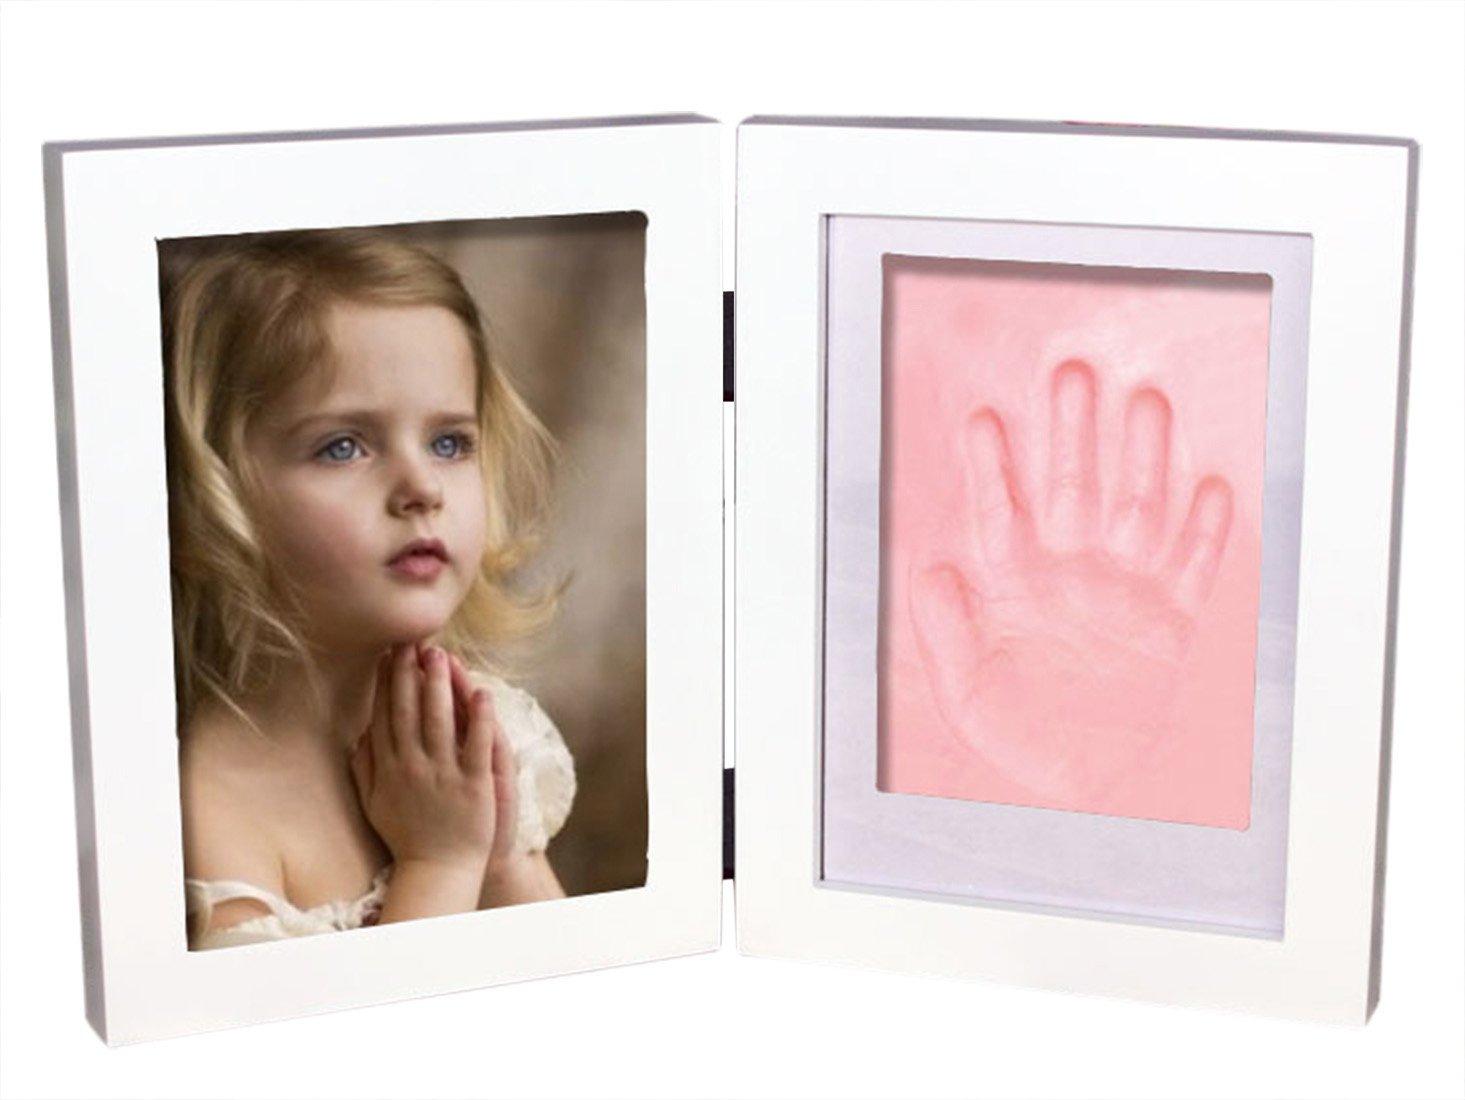 Newborn Babyprints DIY Clay Baby Handprint & Footprint Desk Photo Frame & Impression Kit Frame Keepsake Happy Cherry